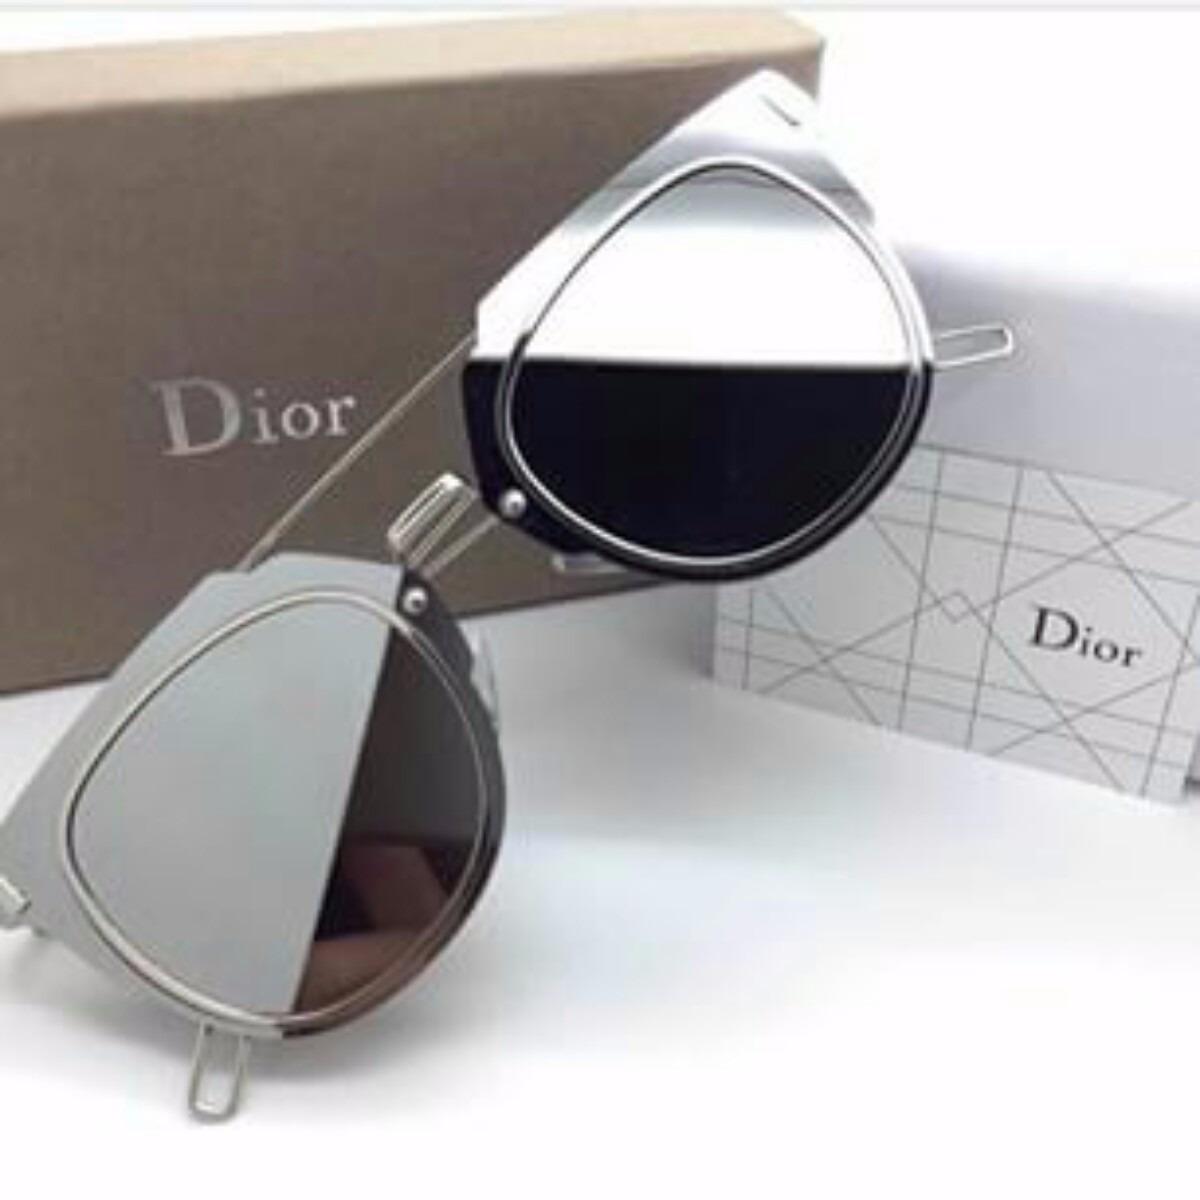 1cbea9d5adf Comprar óculos De Sol Dior « One More Soul